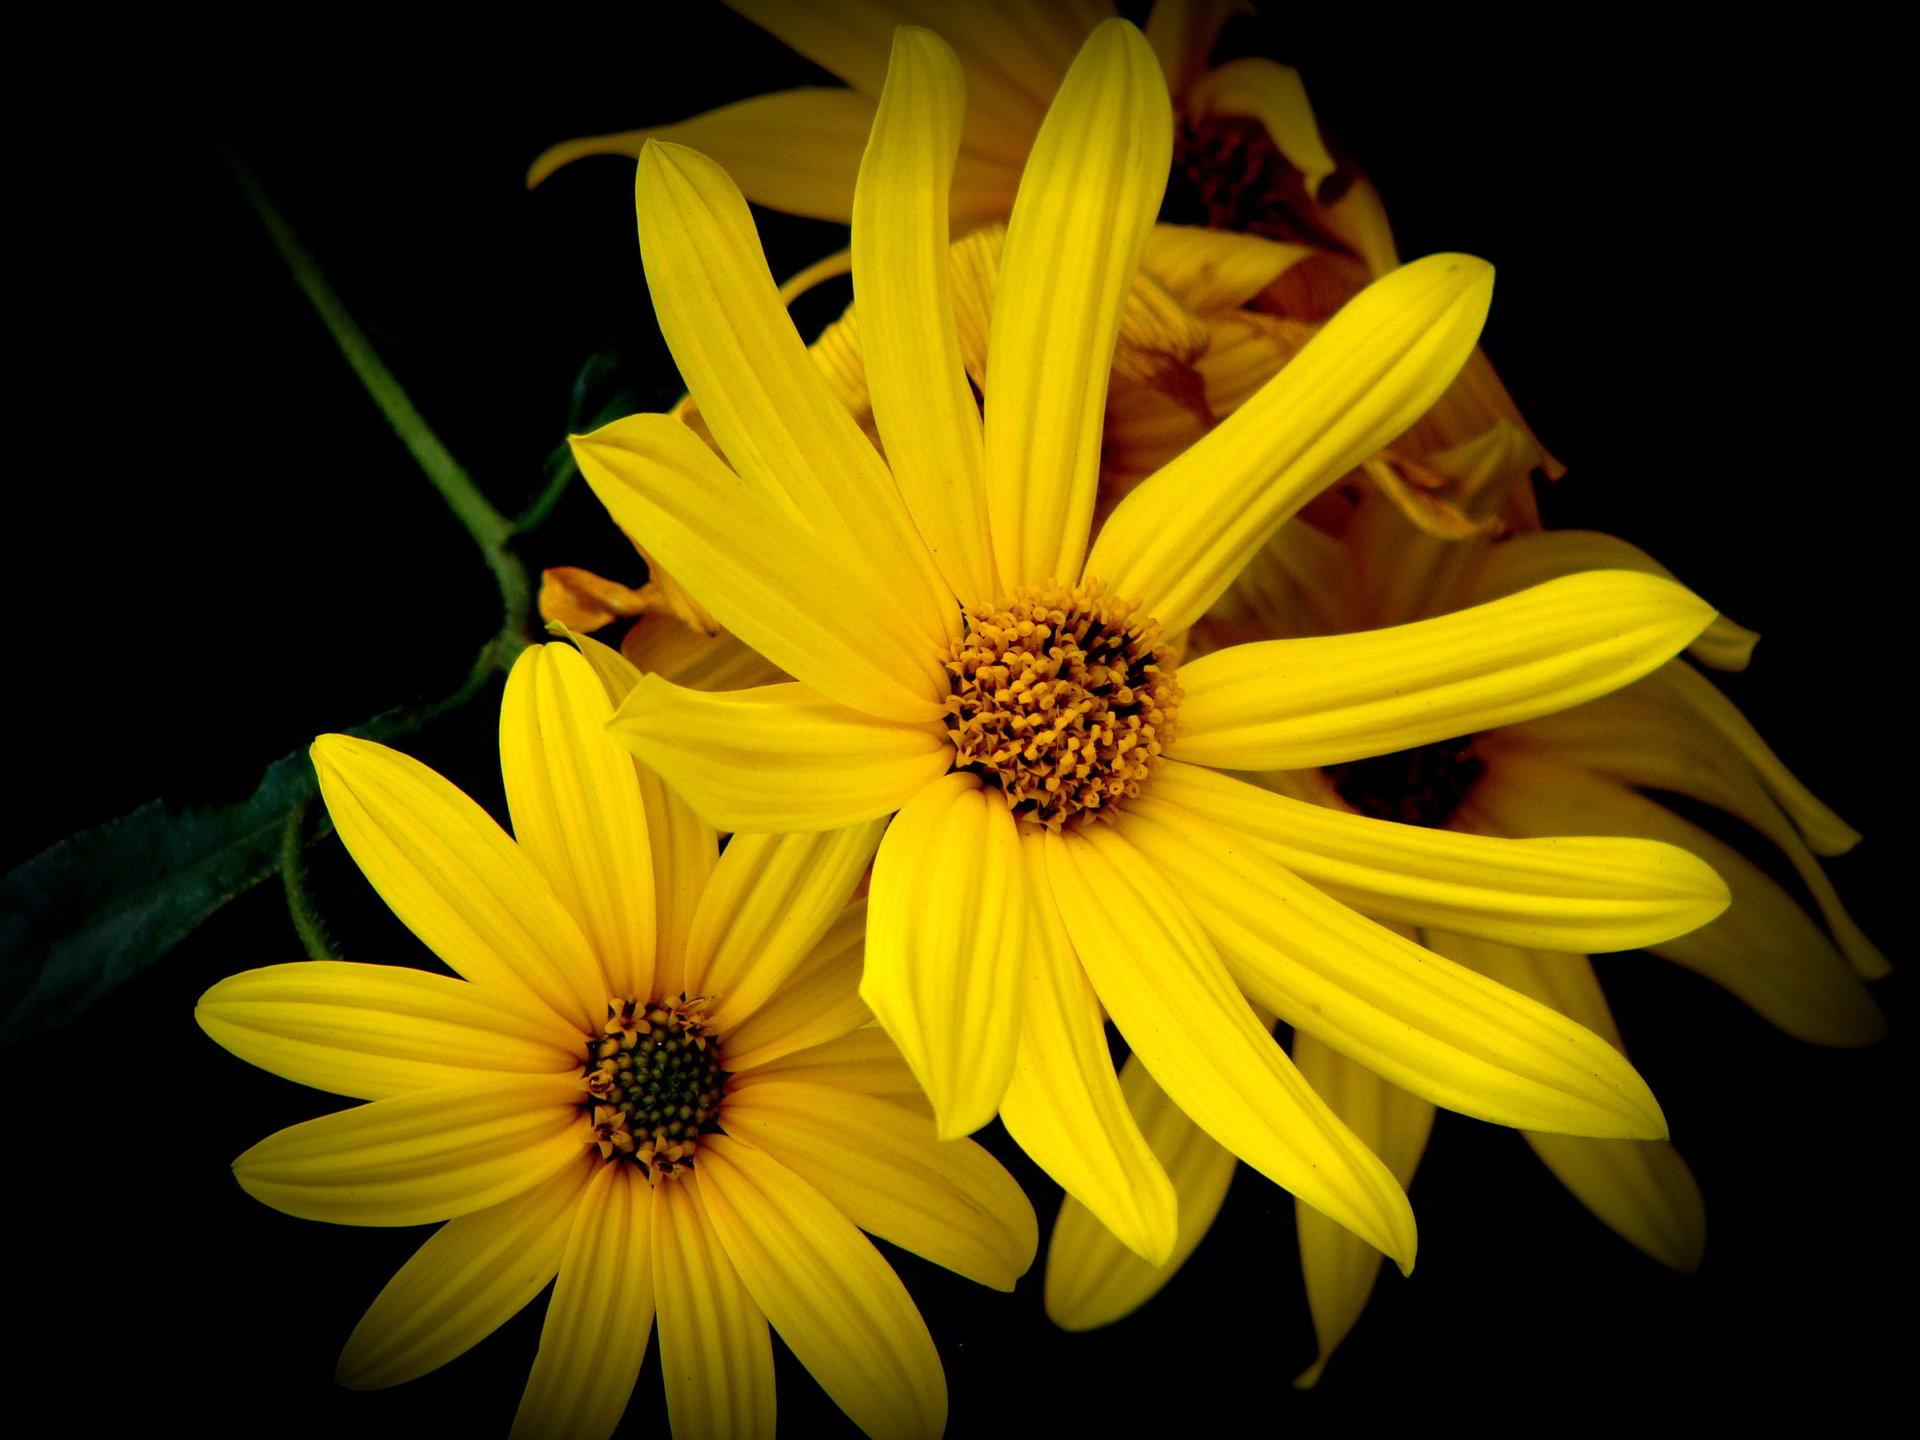 hinh anh hoa cuc dep 48